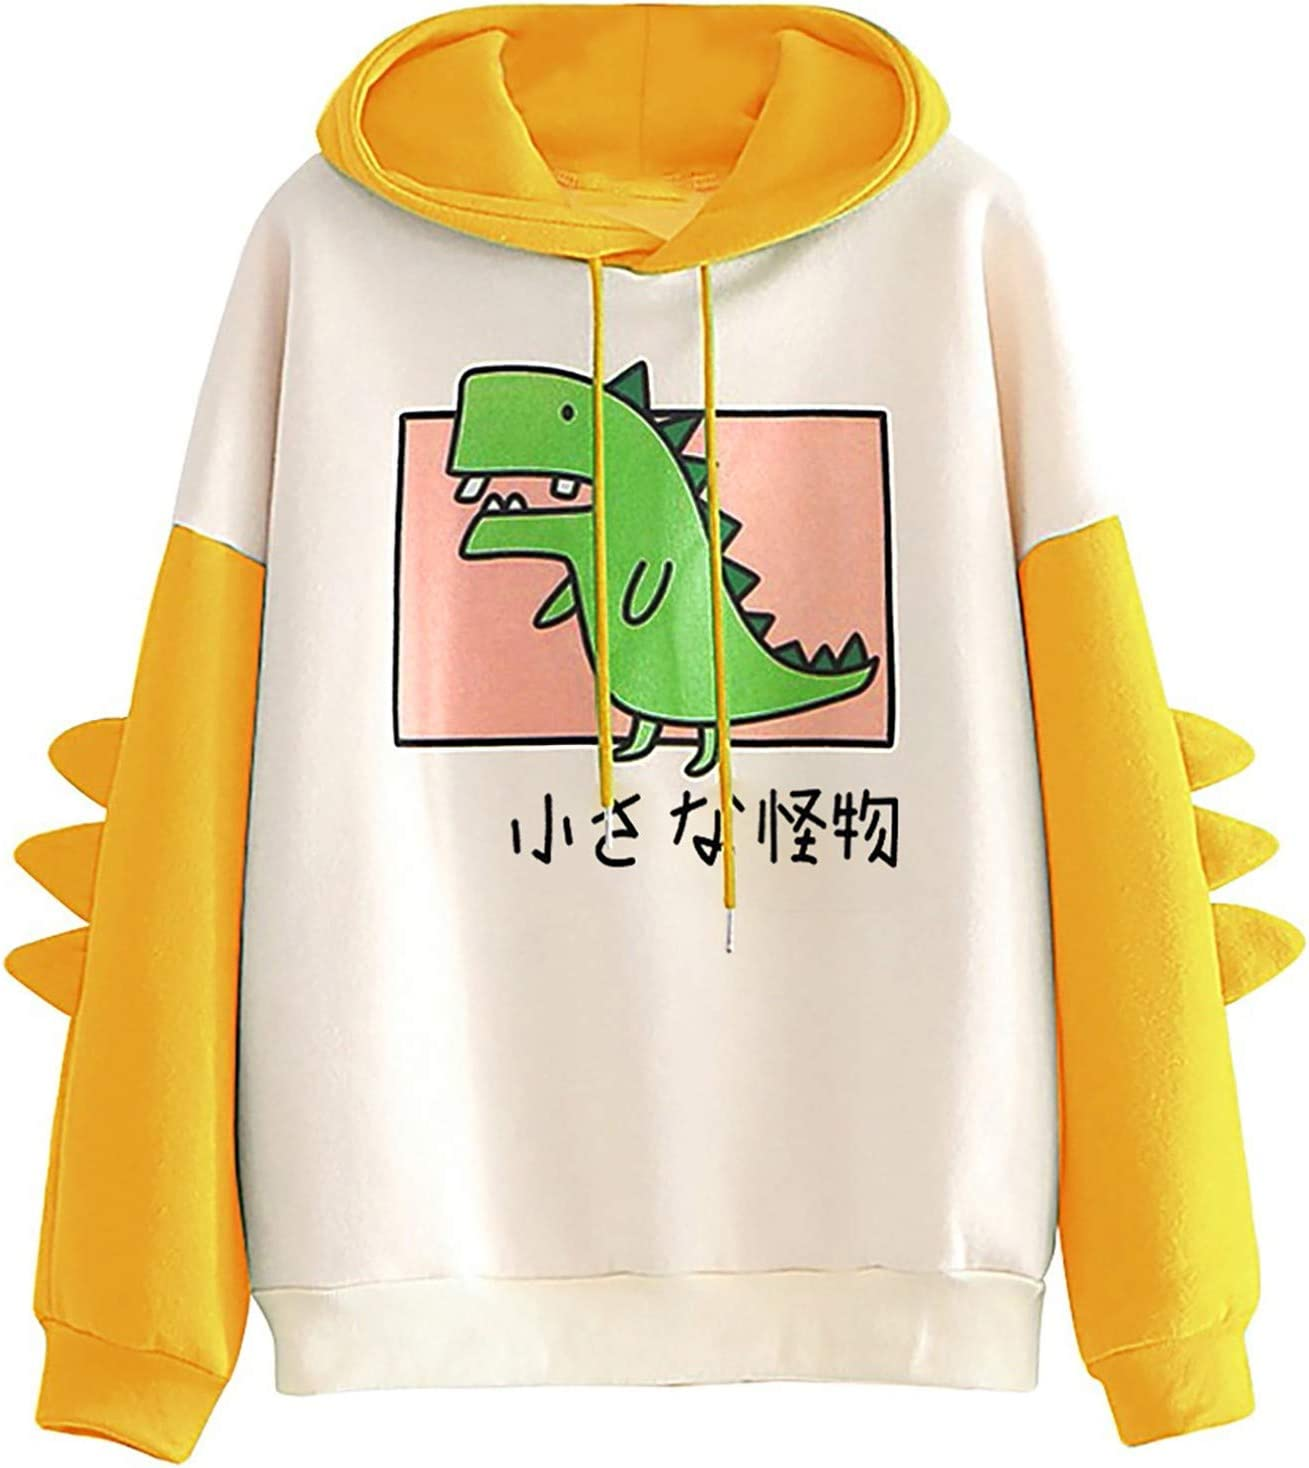 Eoailr Sweatshirt for Women Hoodies Dinosaur Sleeve Long Brand new Factory outlet